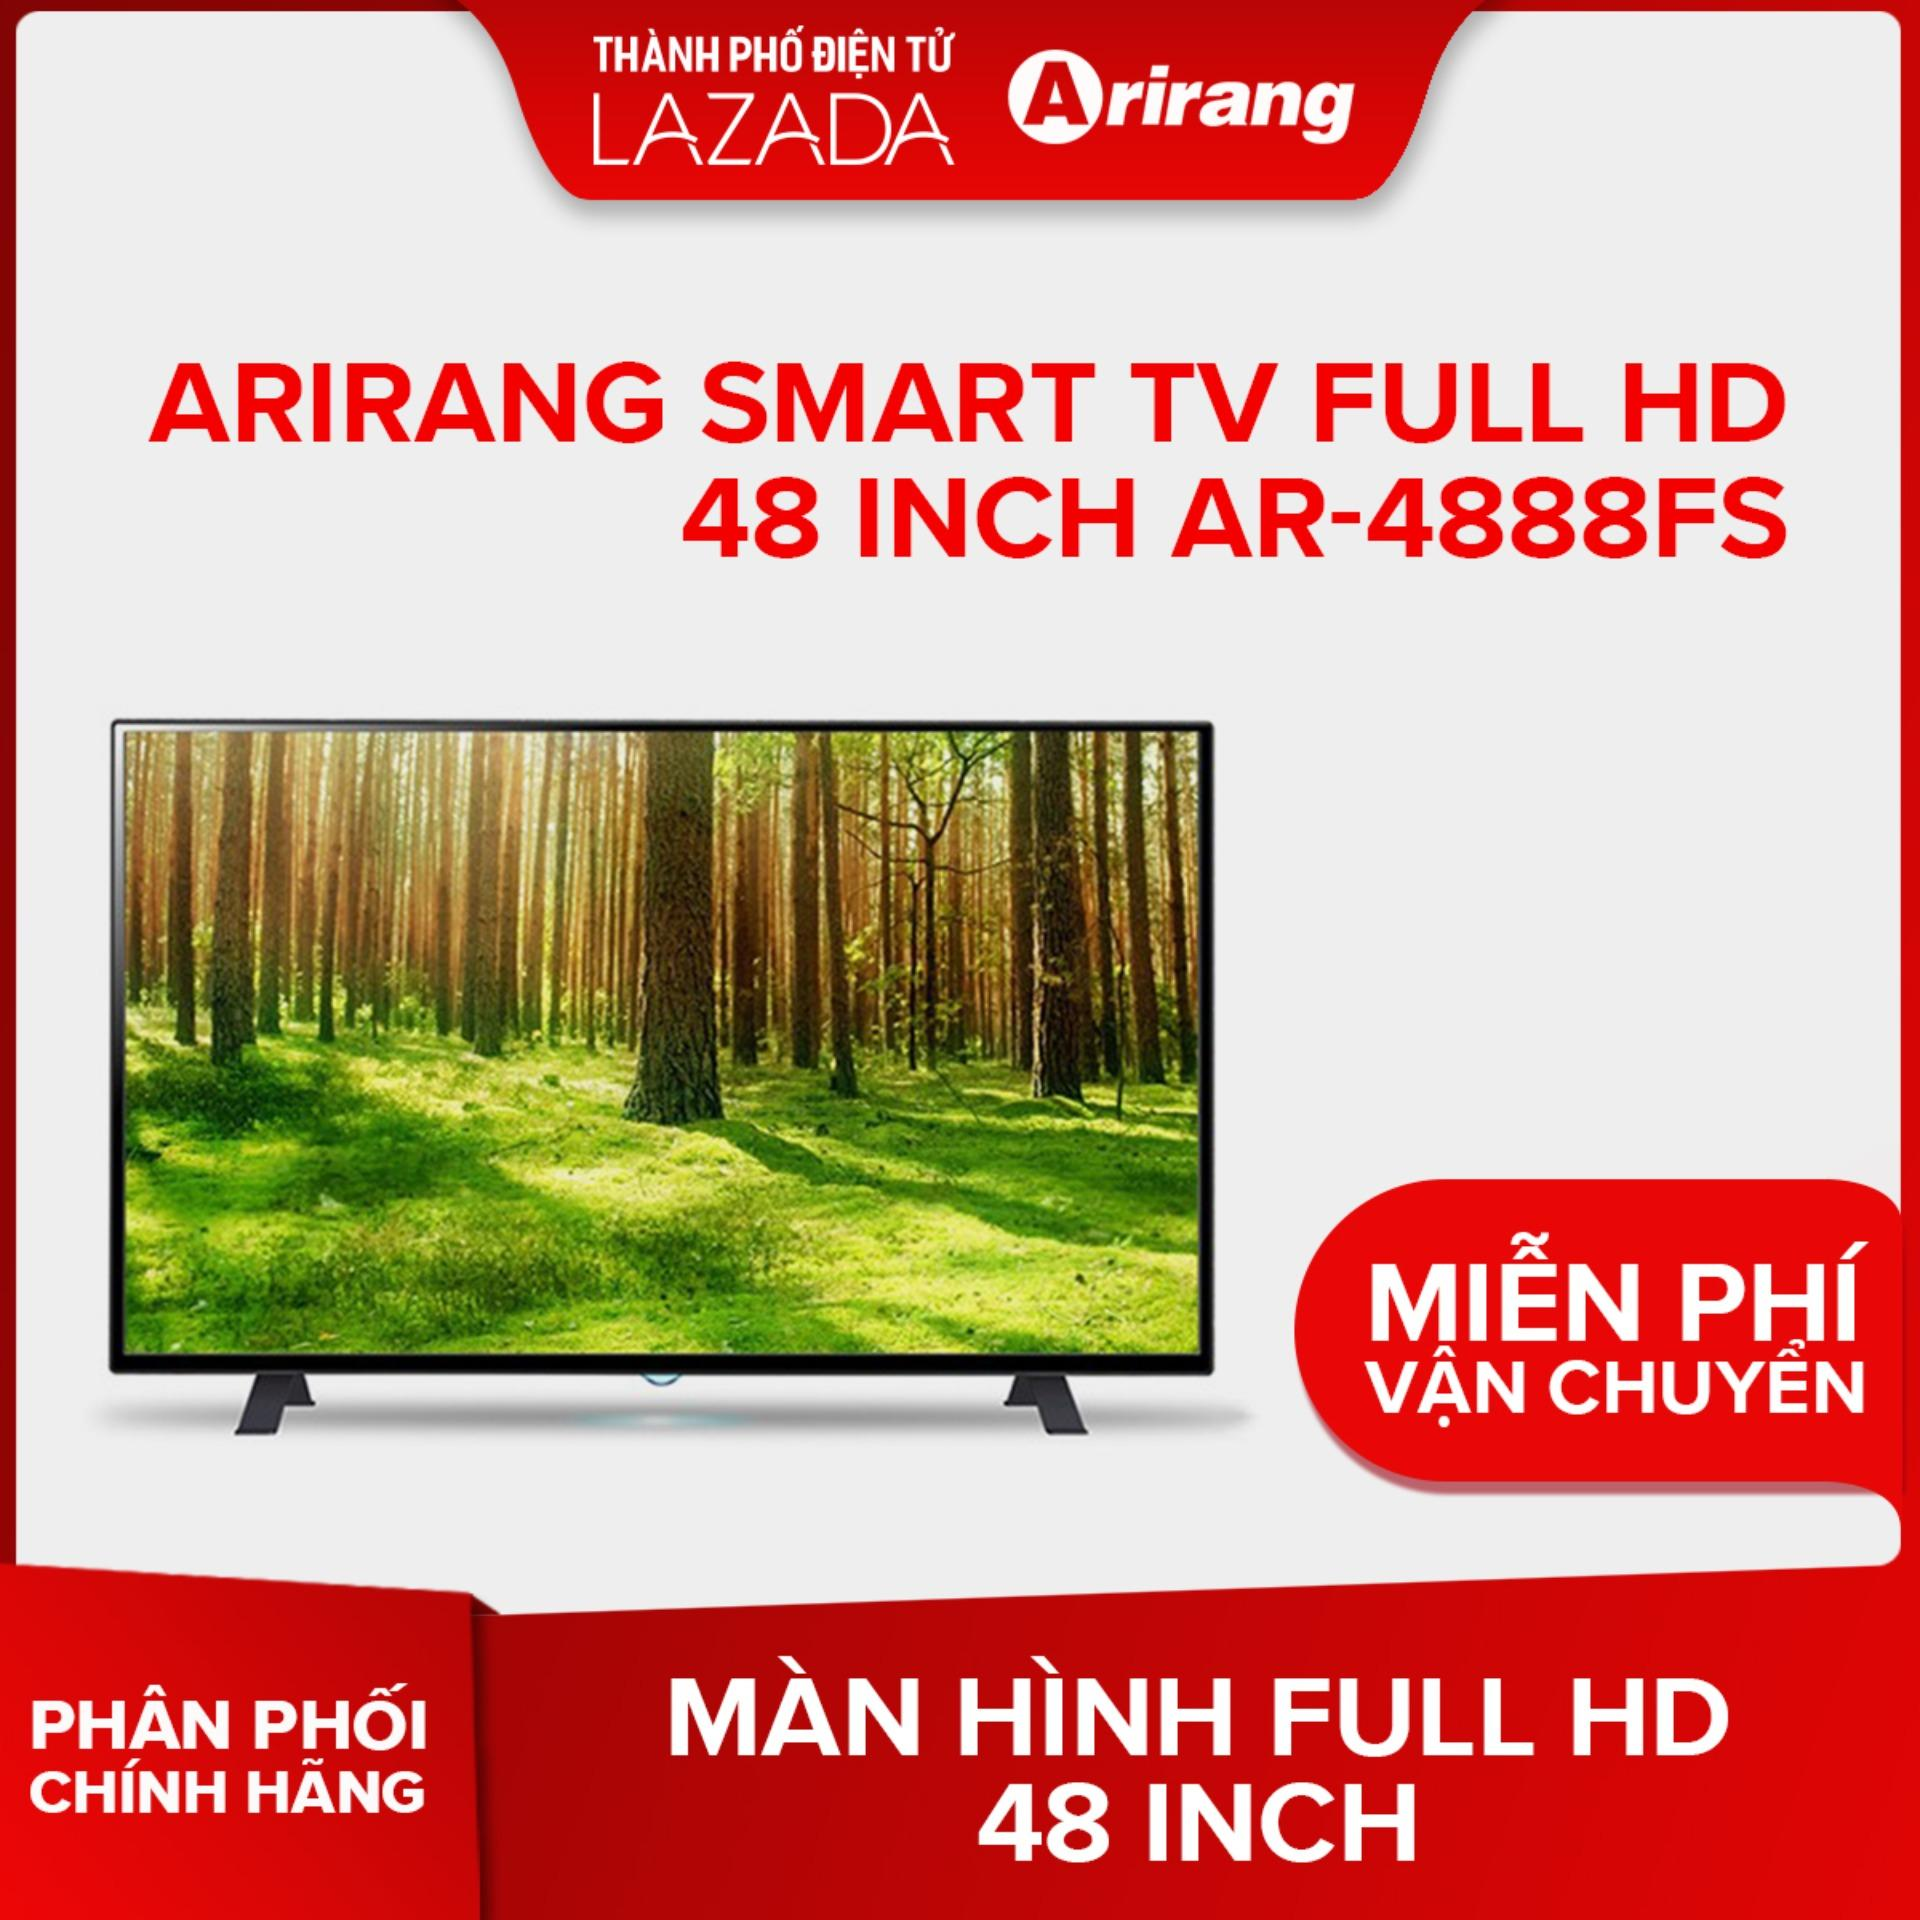 Bảng giá ARIRANG SMART TV FULL HD 48 INCH AR-4888FS